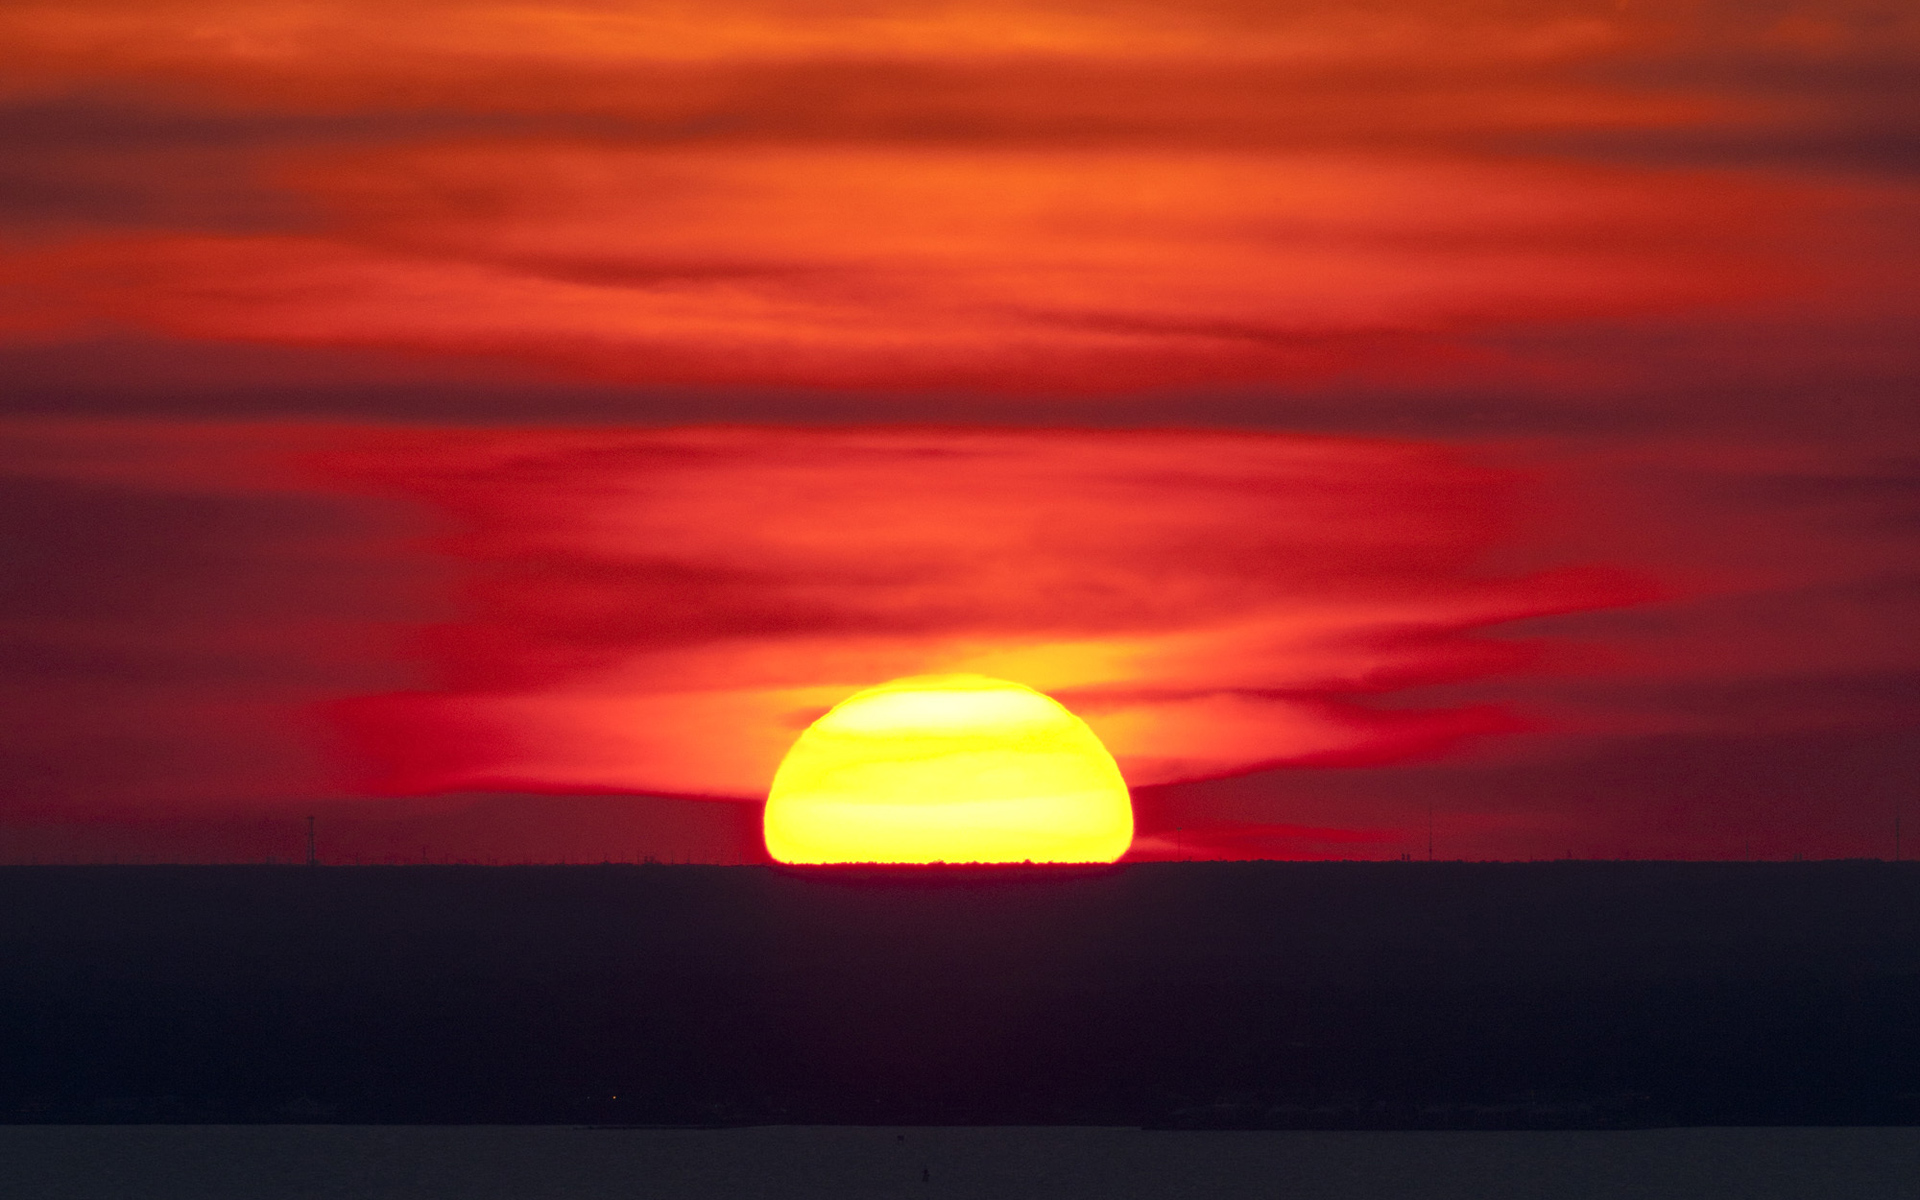 139_sunset-1920